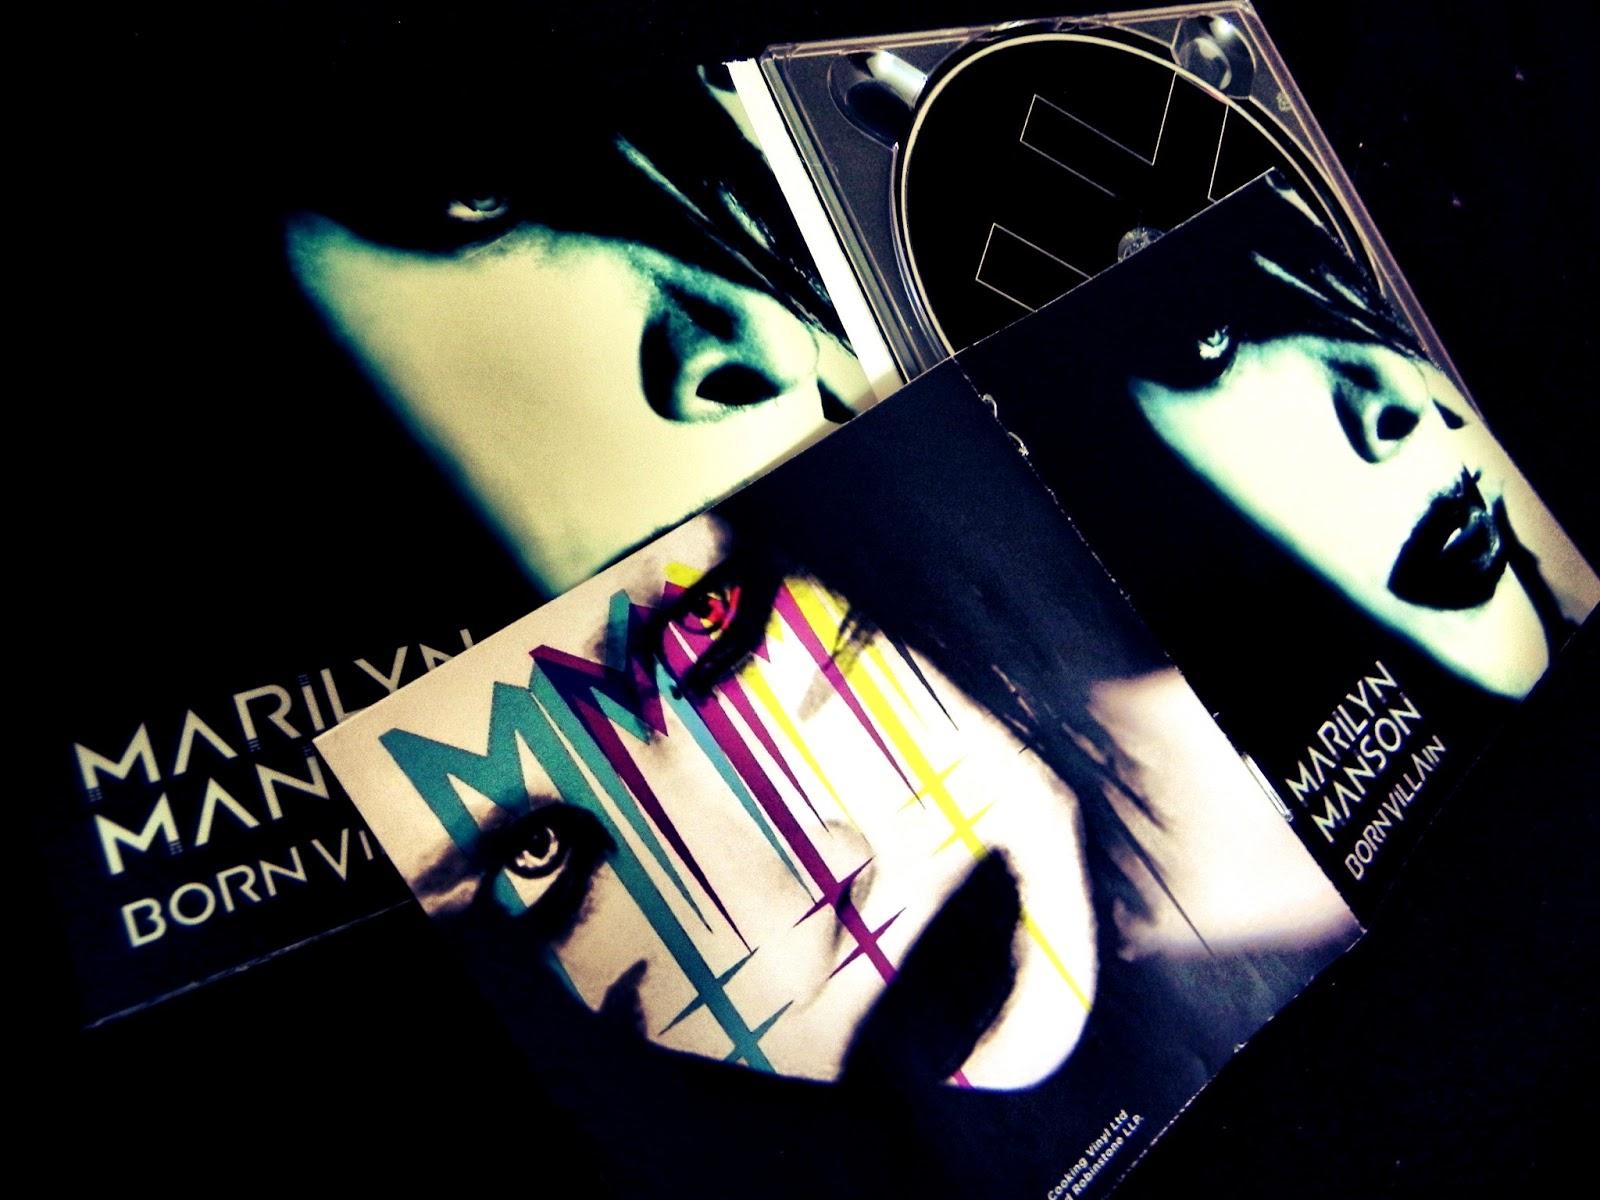 Your Born Villain Album